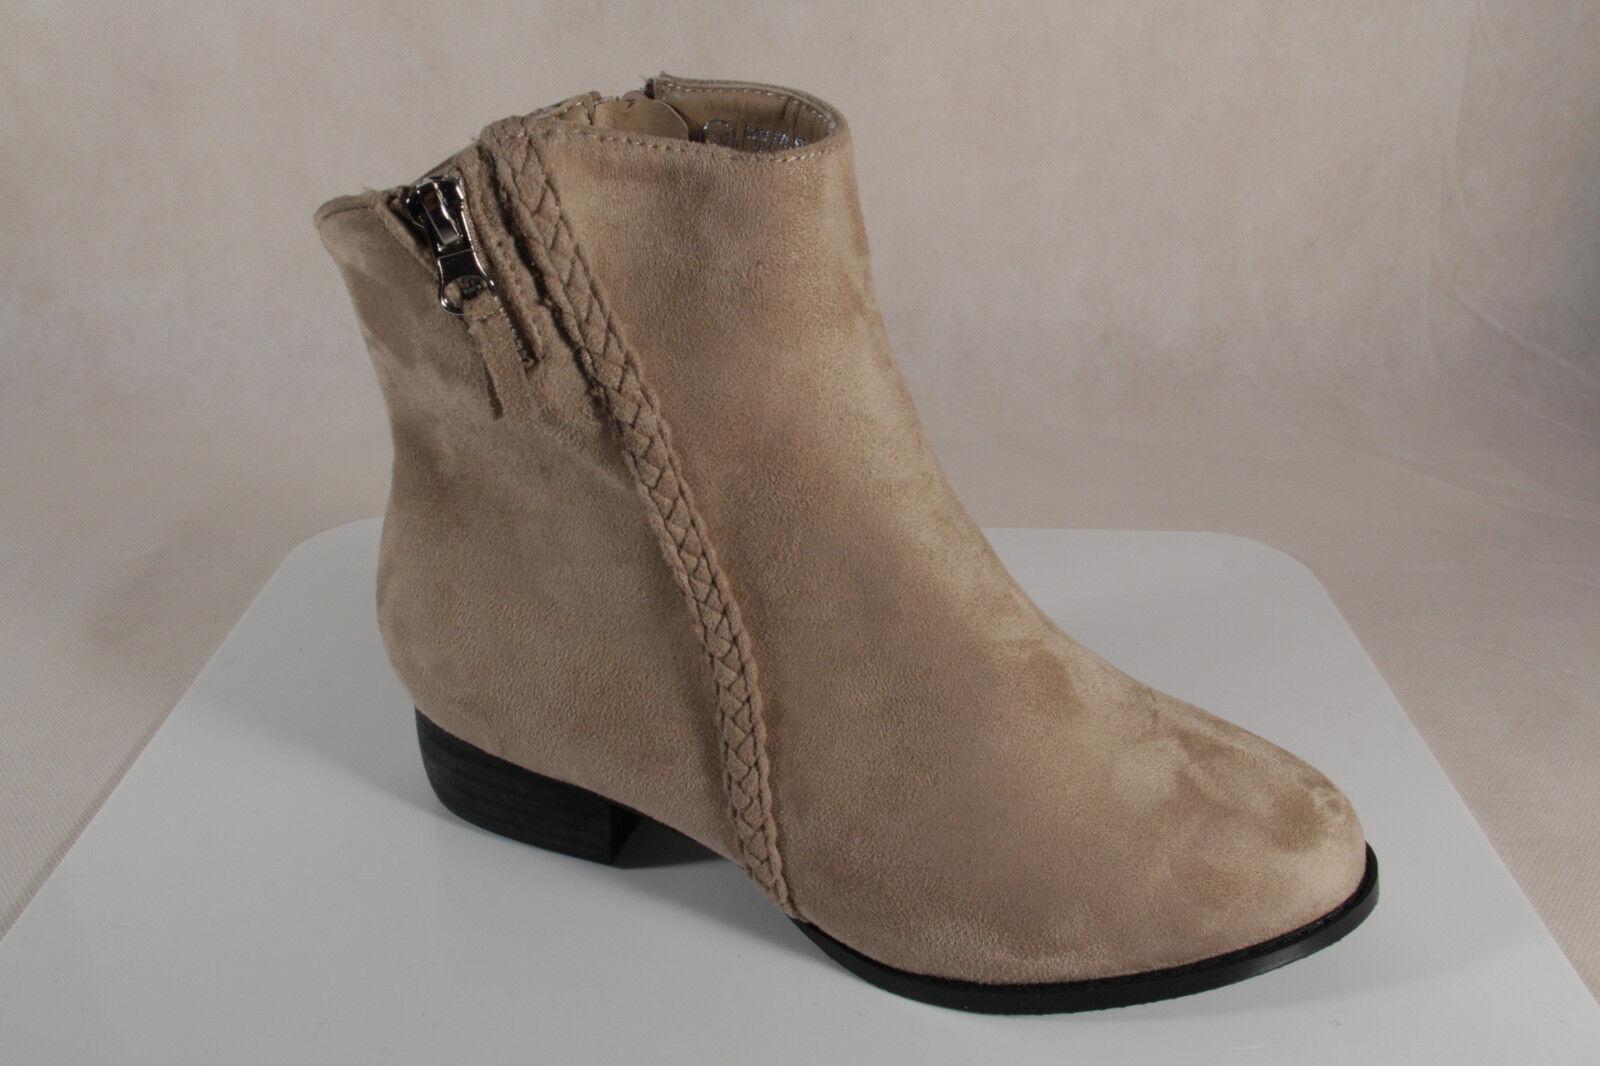 Top or bottes pour Femme Bottines bottes bottes D'Hiver Beige Rv Neuf Sport